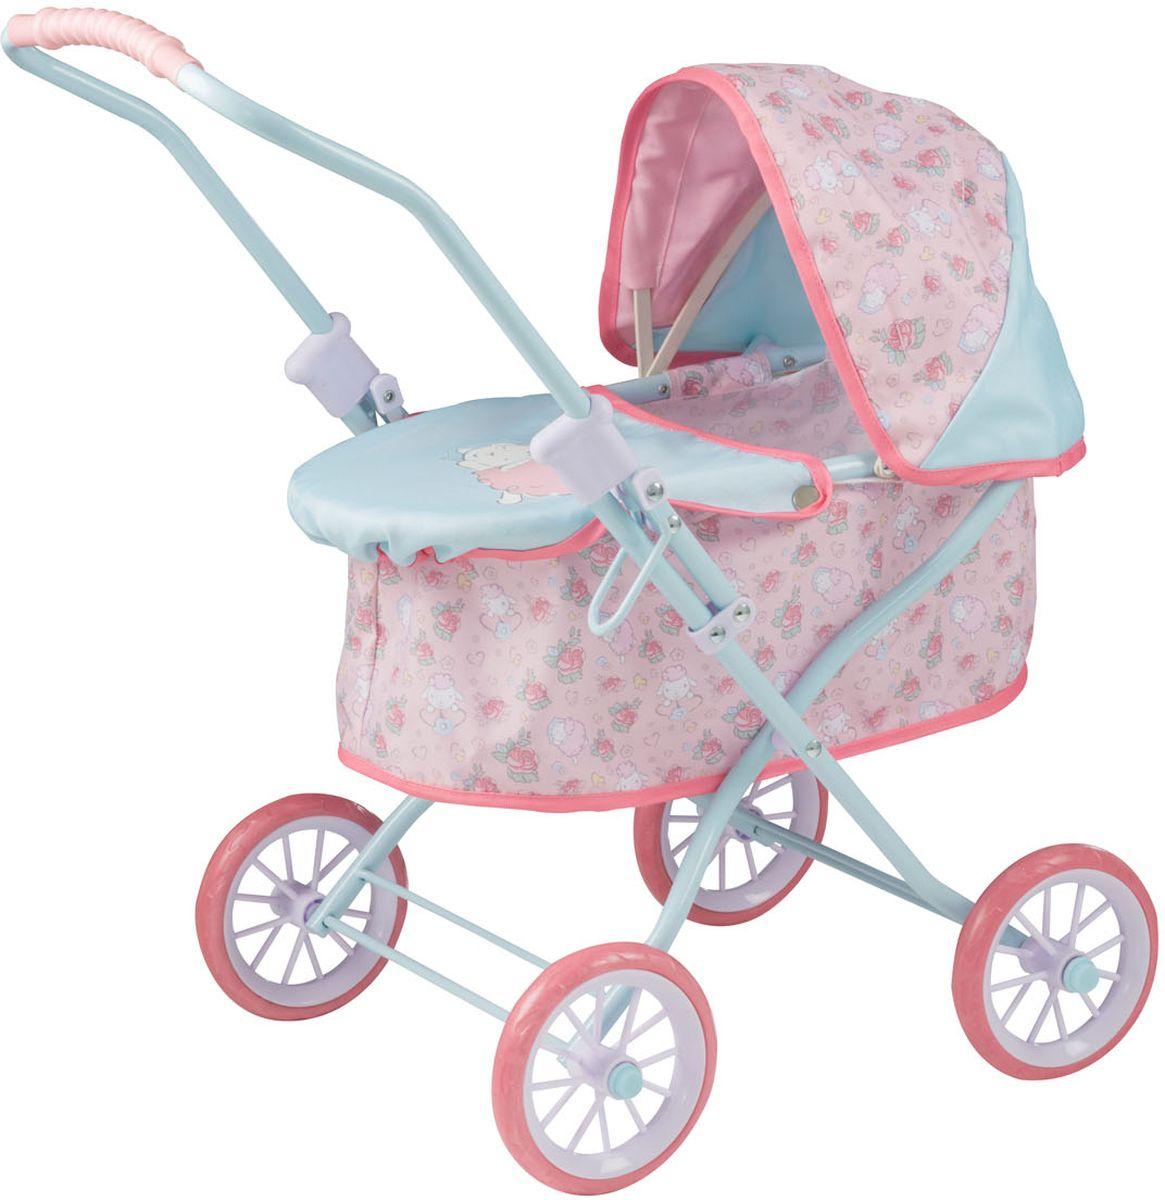 Zapf Creation Коляска для кукол Baby Annabell zapf creation коляска трость для кукол baby annabell